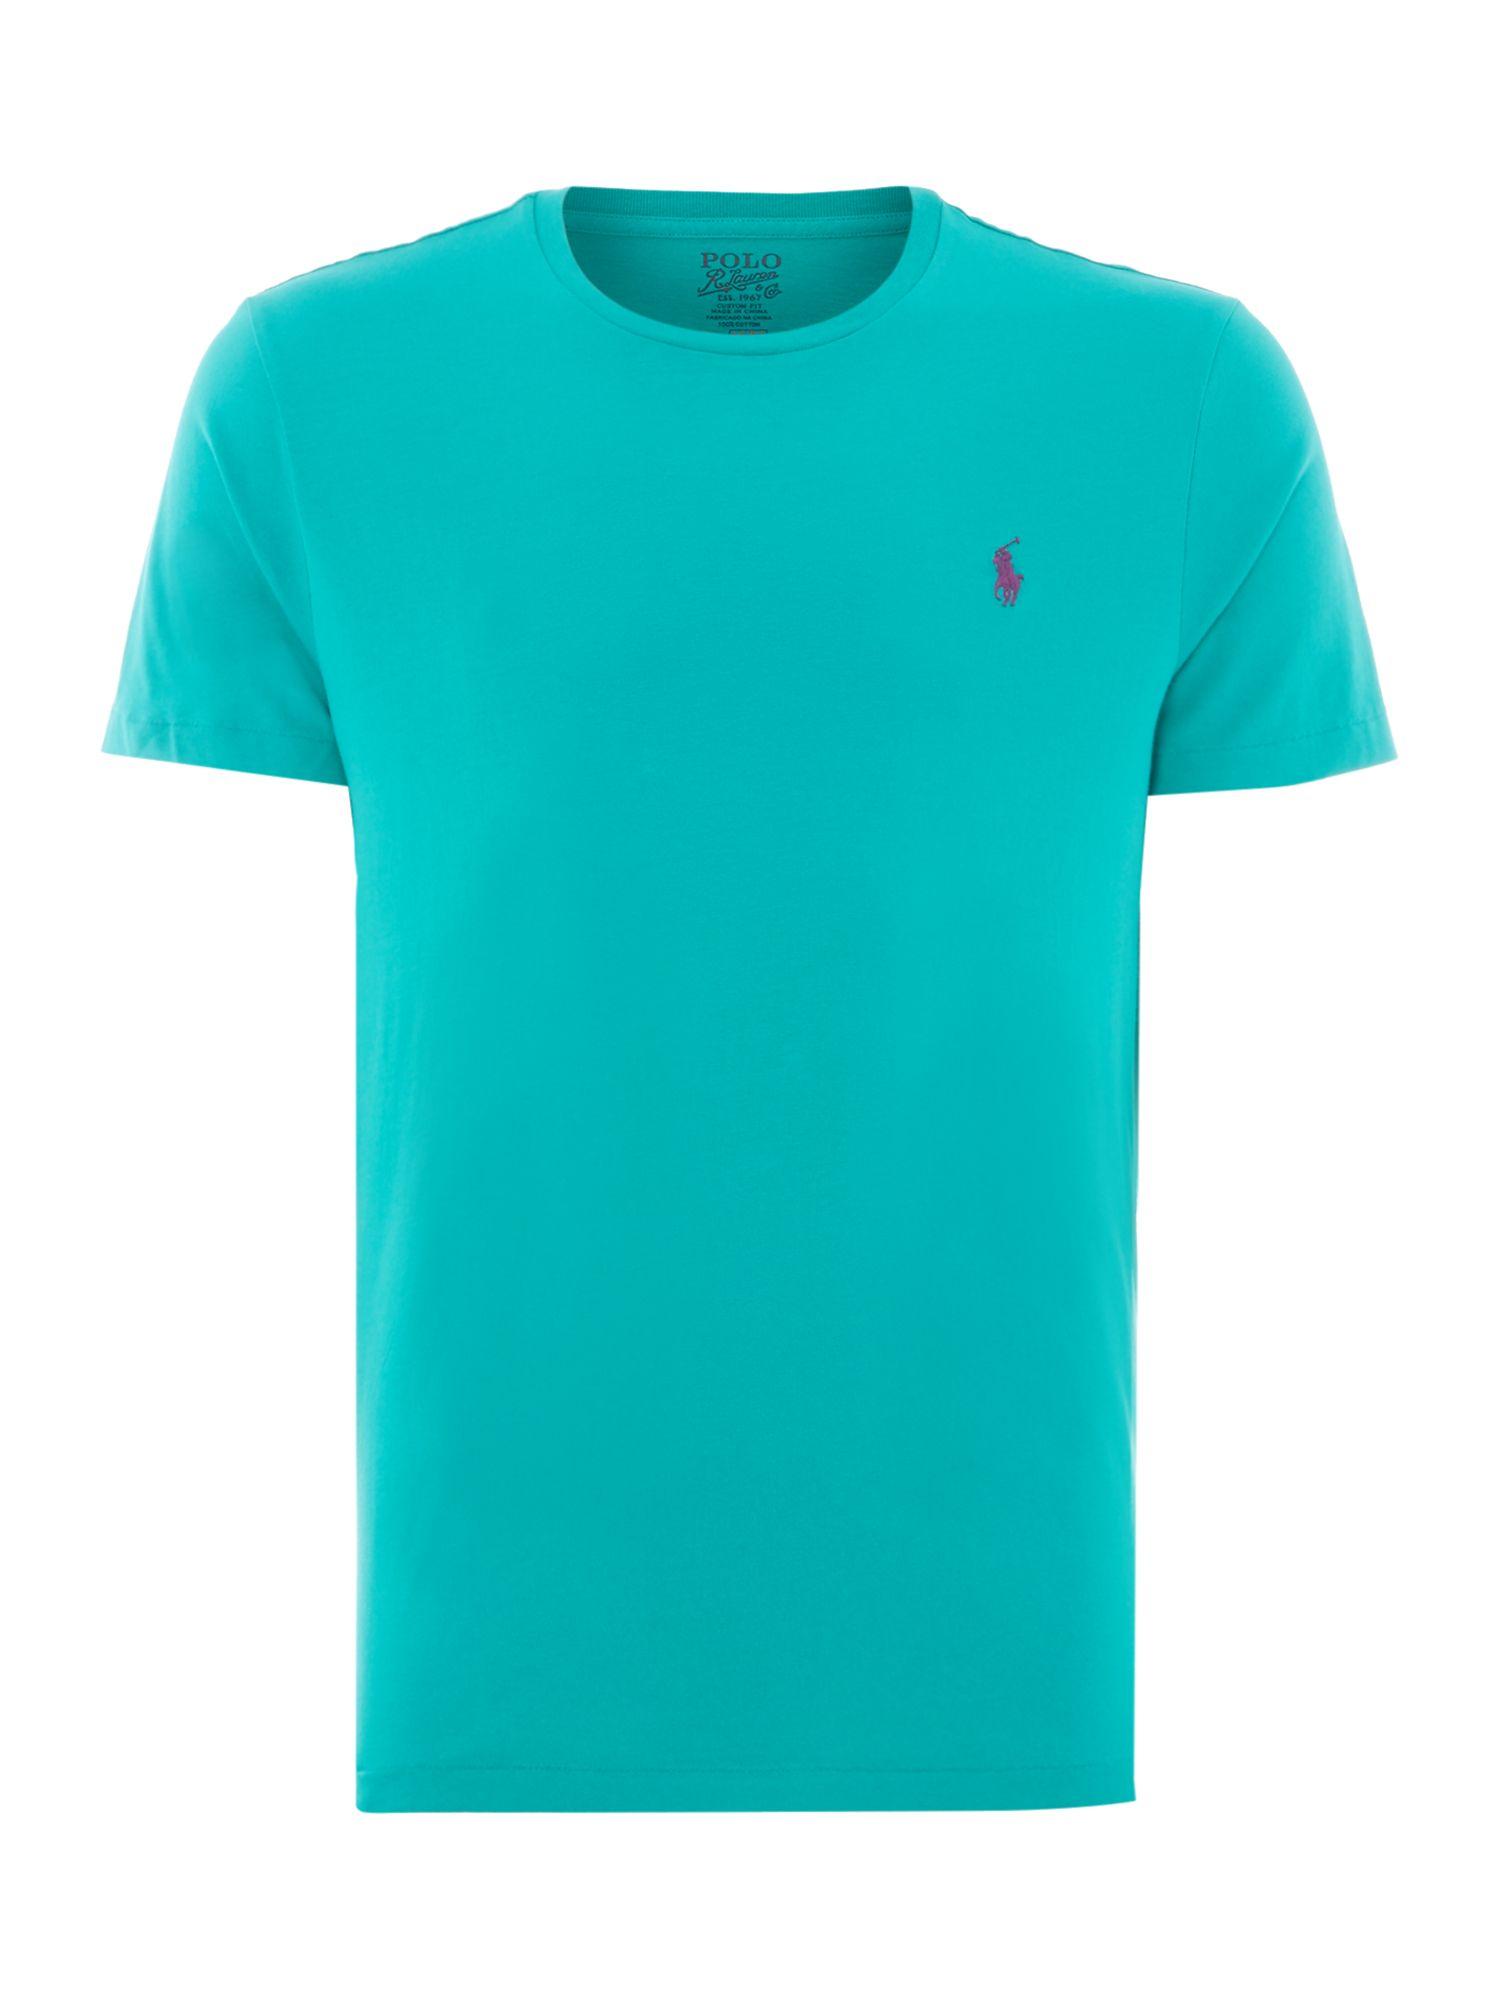 Polo ralph lauren crew neck combed jersey t shirt in blue for Ralph lauren polo jersey shirt